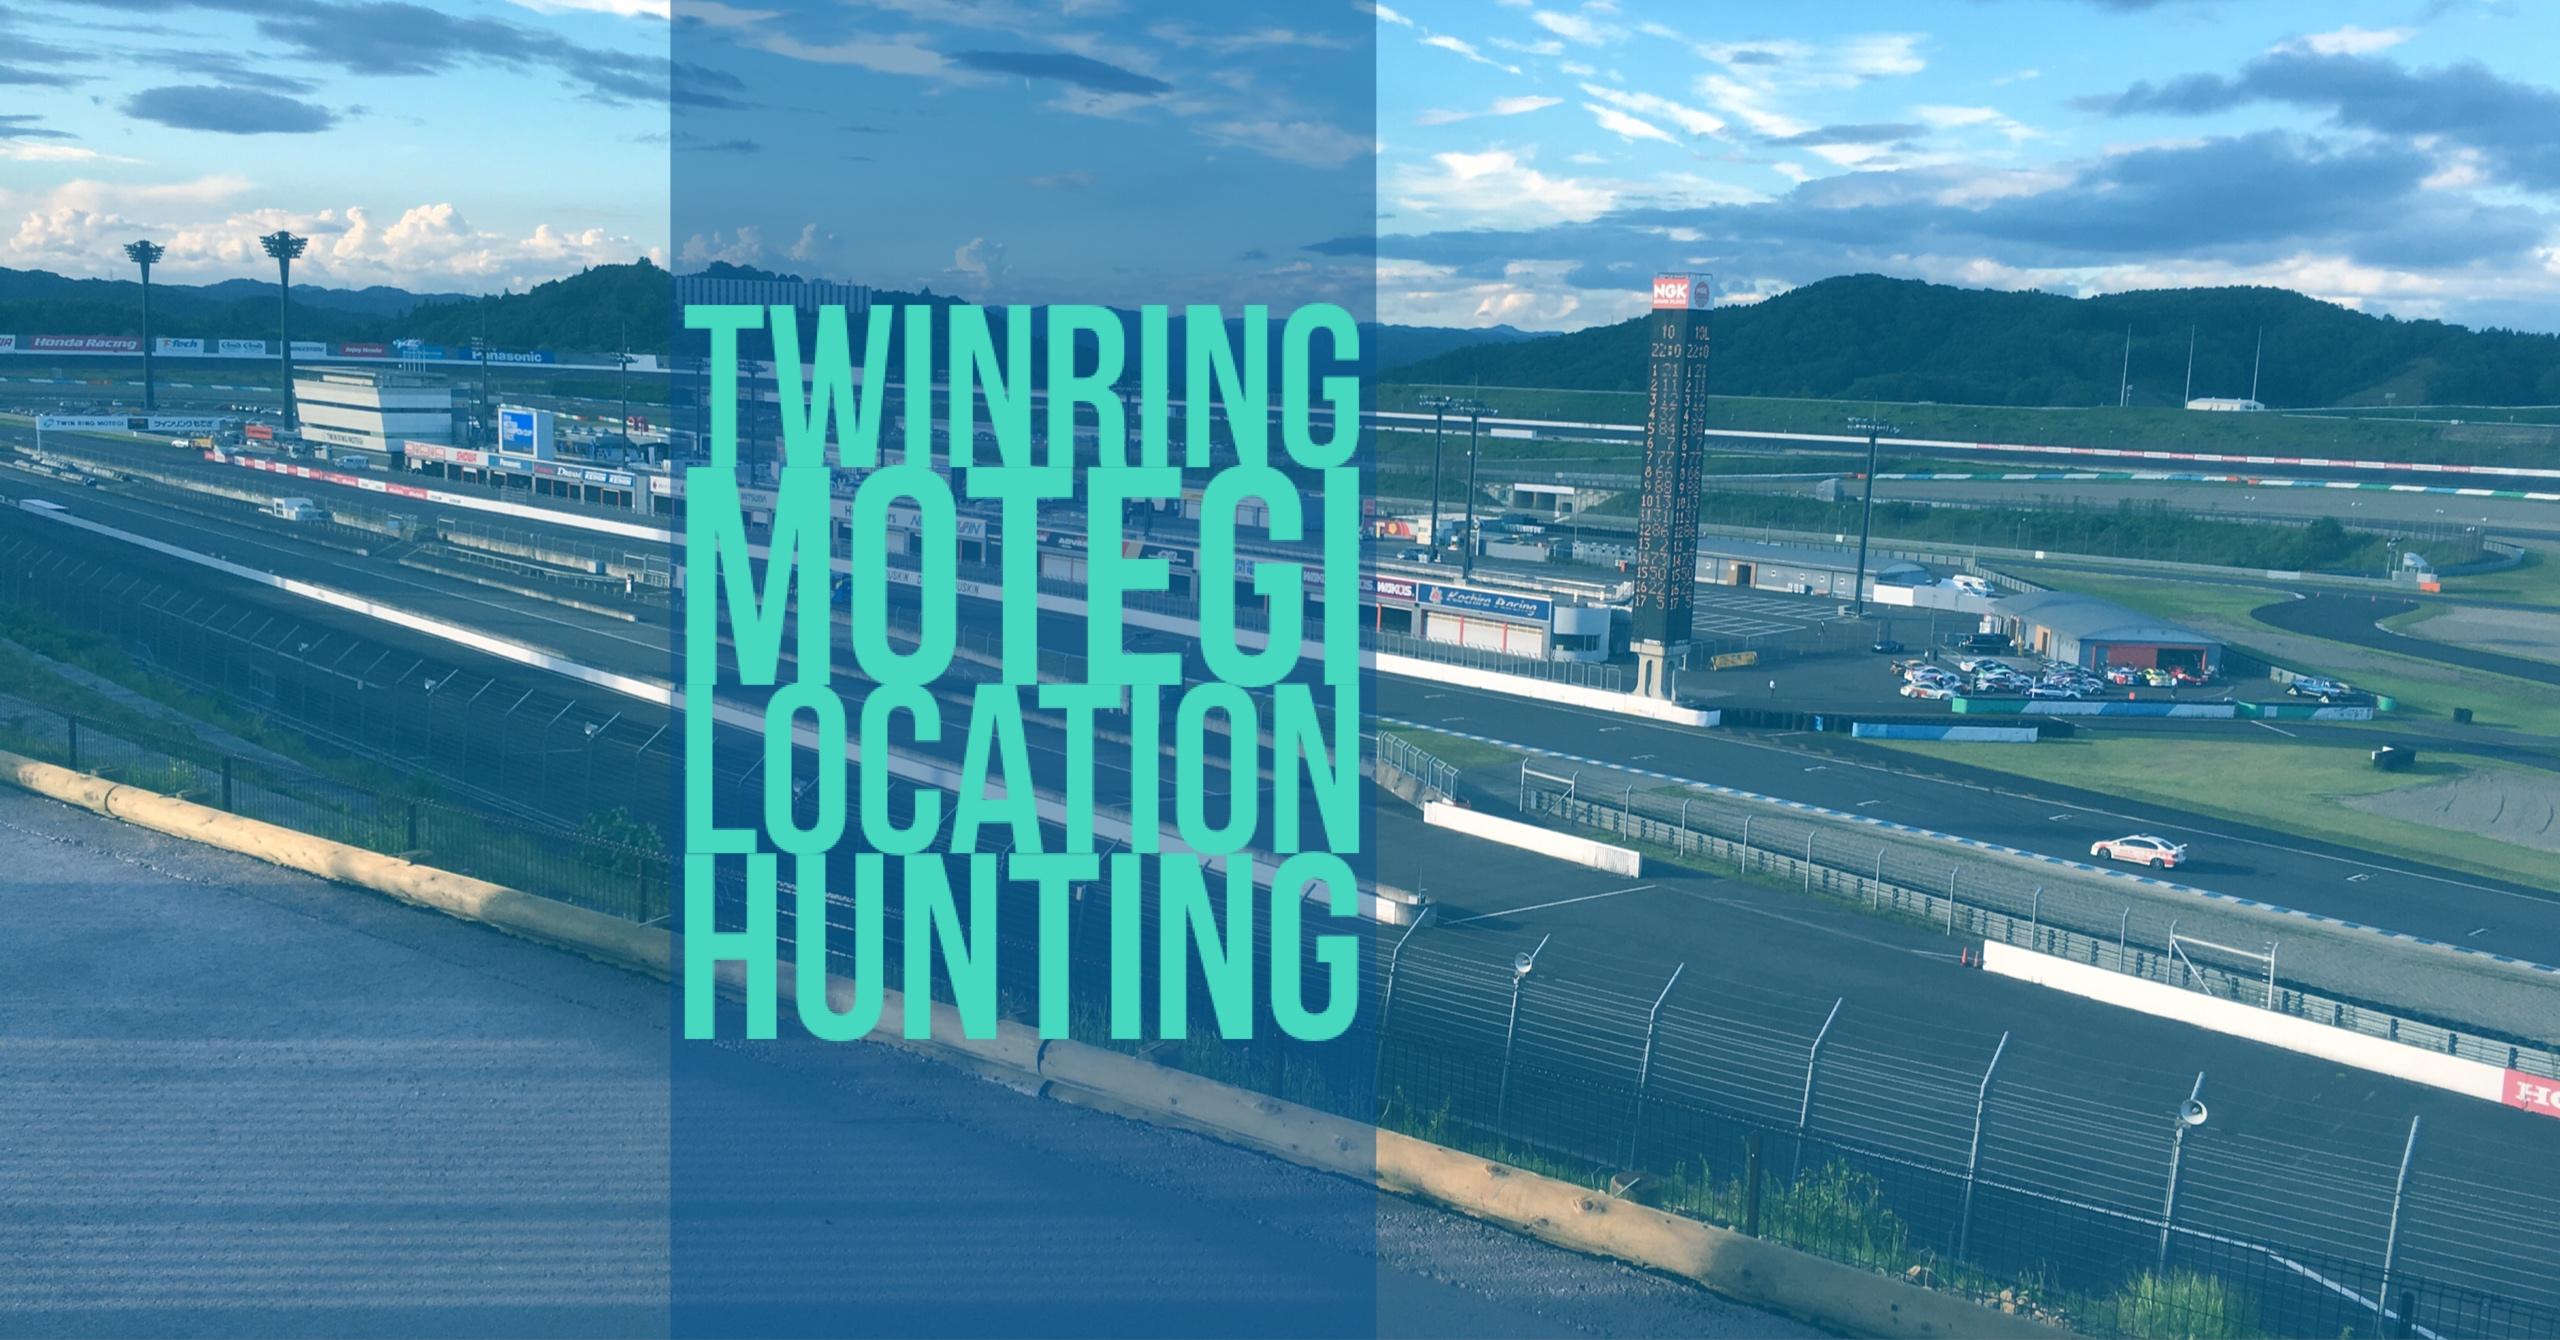 Twinring Motegi Location Hunting